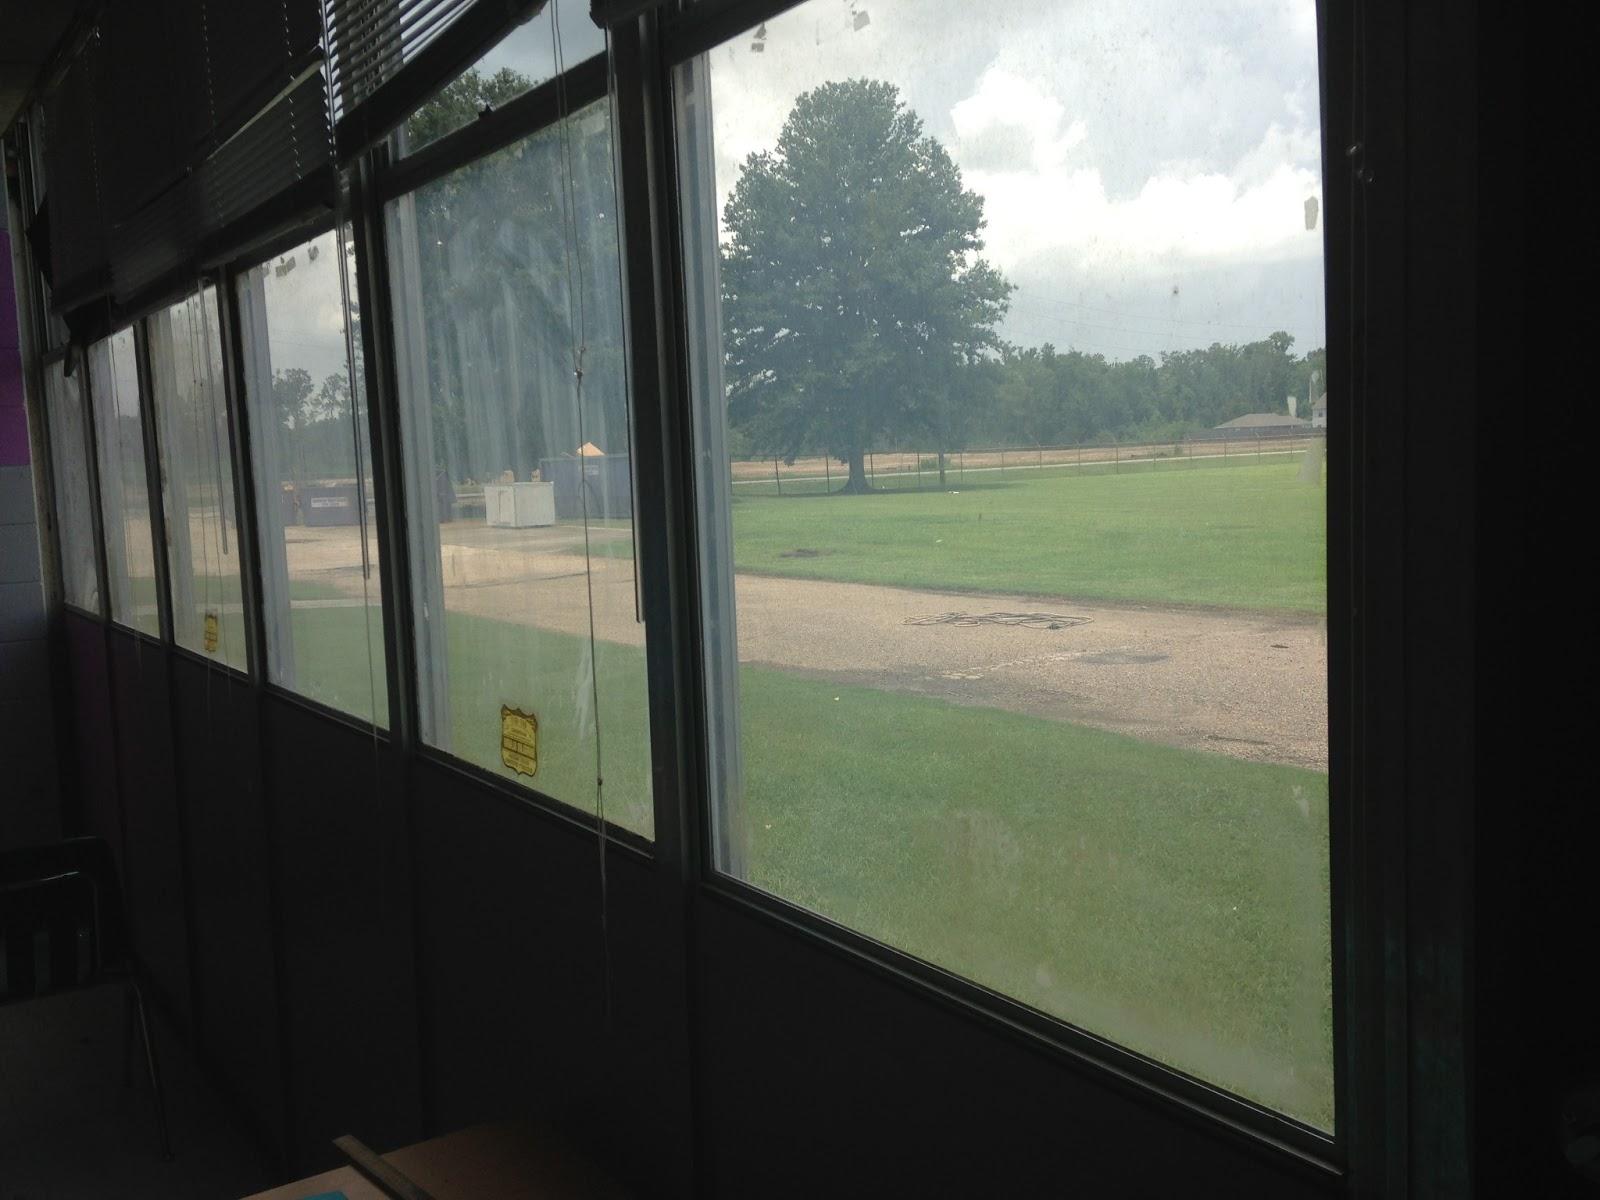 Classroom window - So Many Windows To Cover